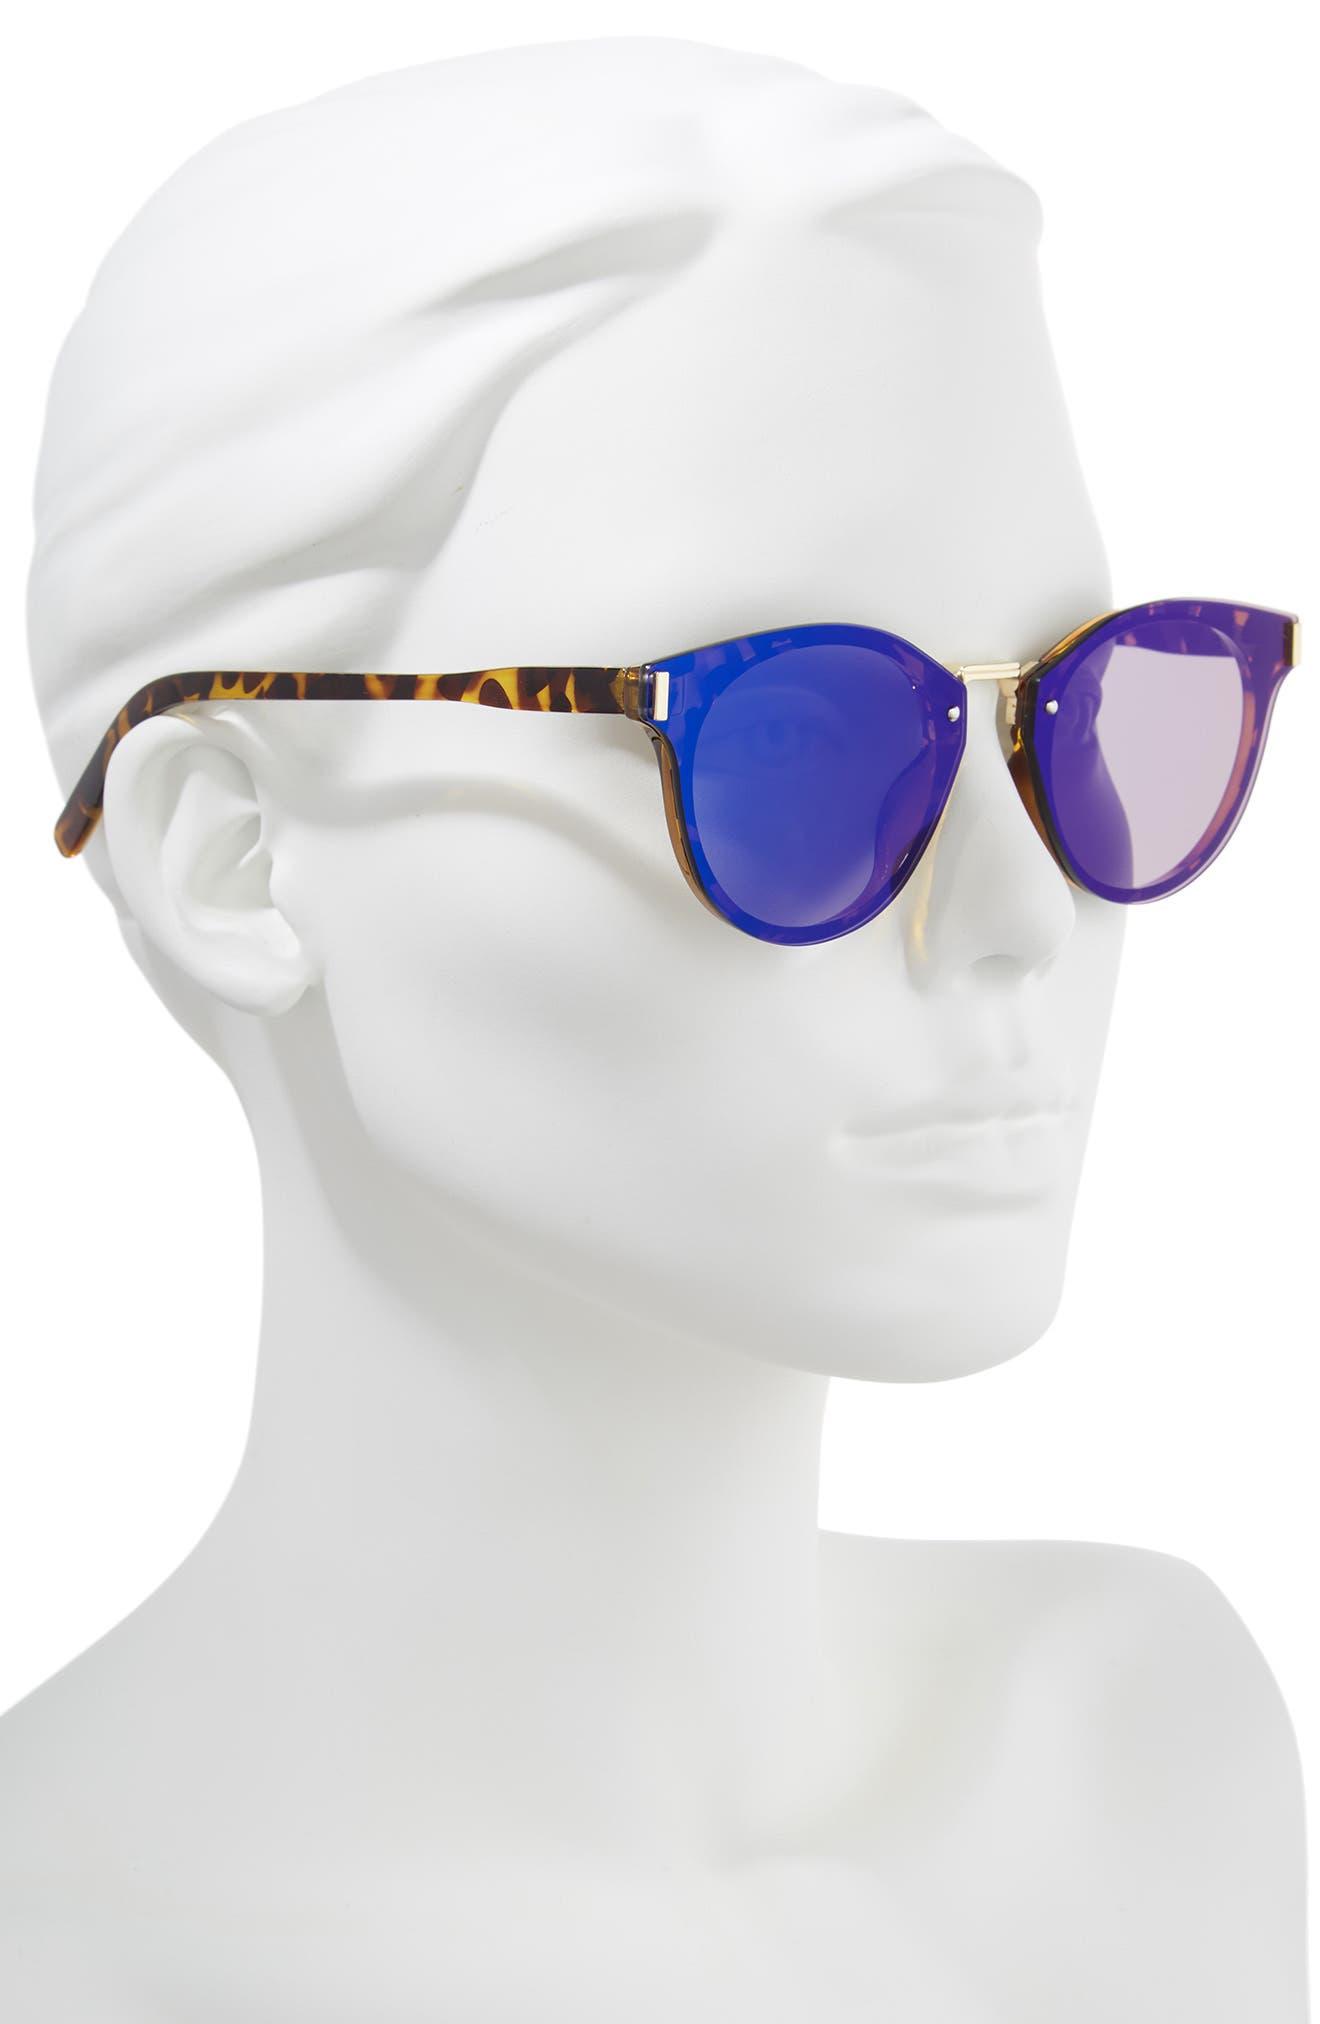 Flat Cat Eye Sunglasses,                             Alternate thumbnail 2, color,                             Tort/ Blue